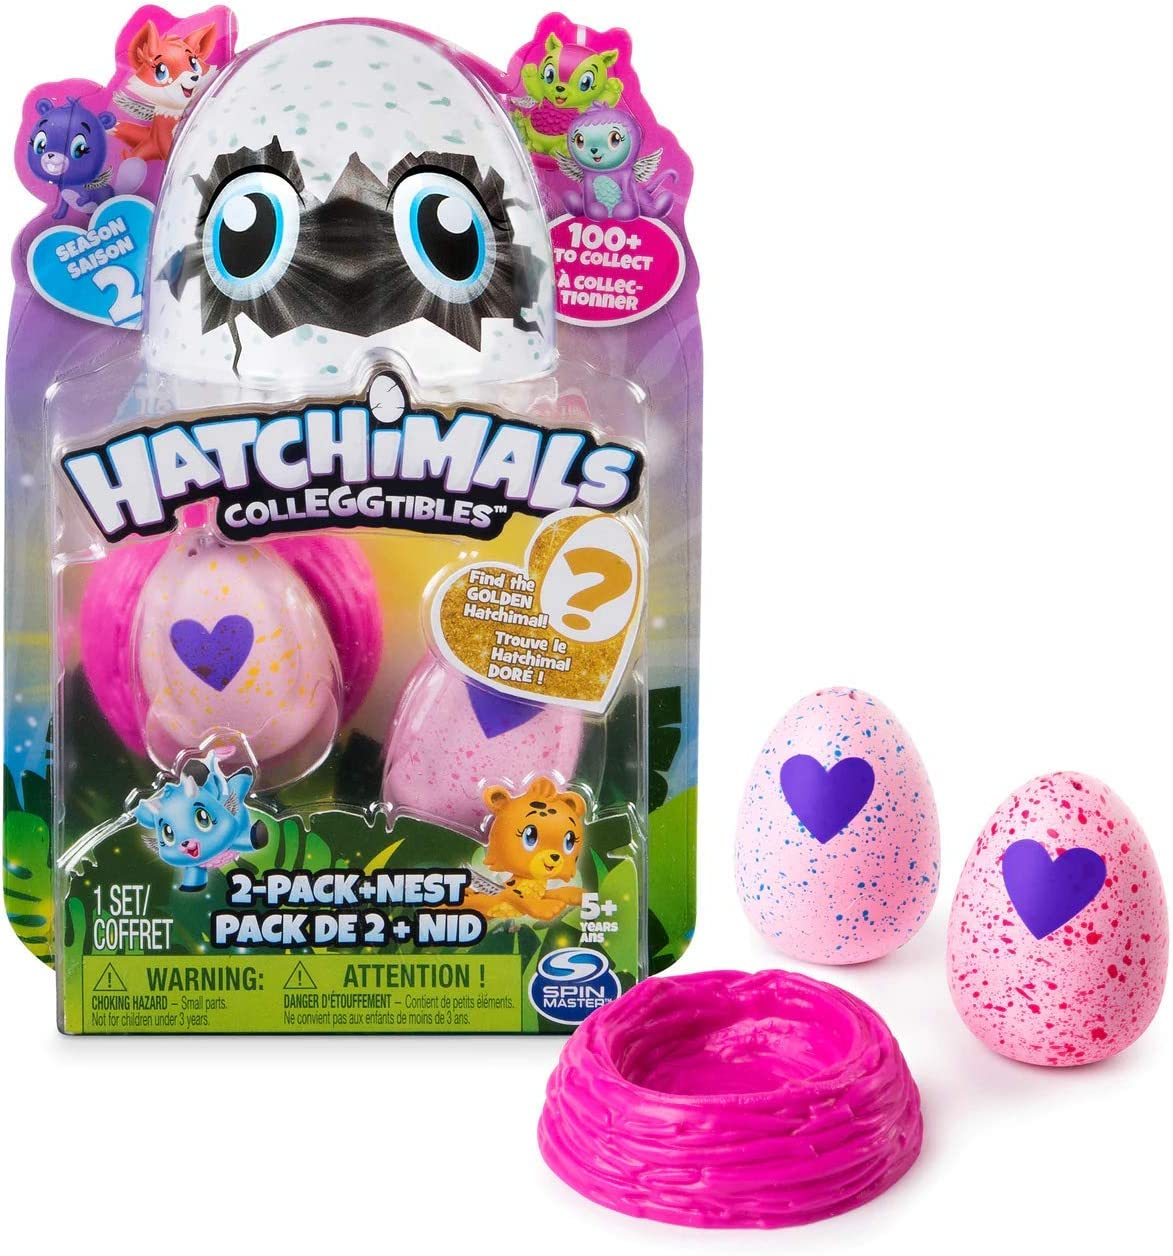 Amazon Com Spinmaster Hatchimals Colleggtibles 2 Pack Nest Season 2 Find The Golden Hatchimal 1 Set Multicolor Toys Games